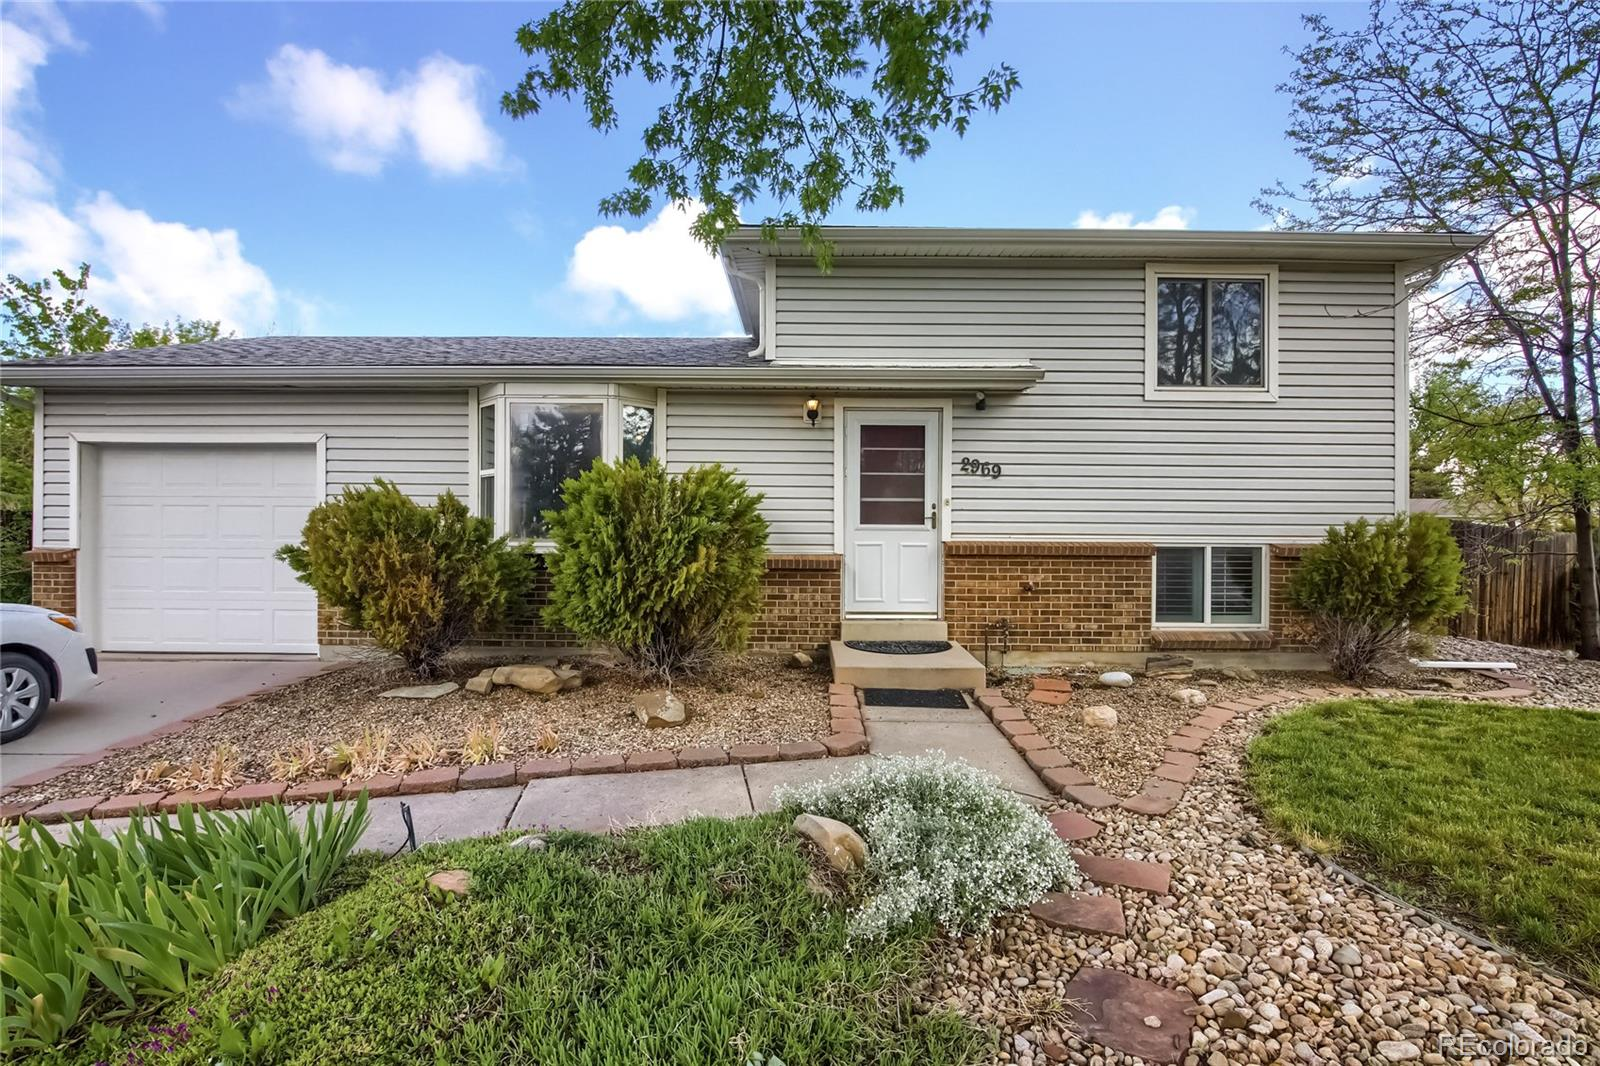 2969 S Winston Street Property Photo - Aurora, CO real estate listing